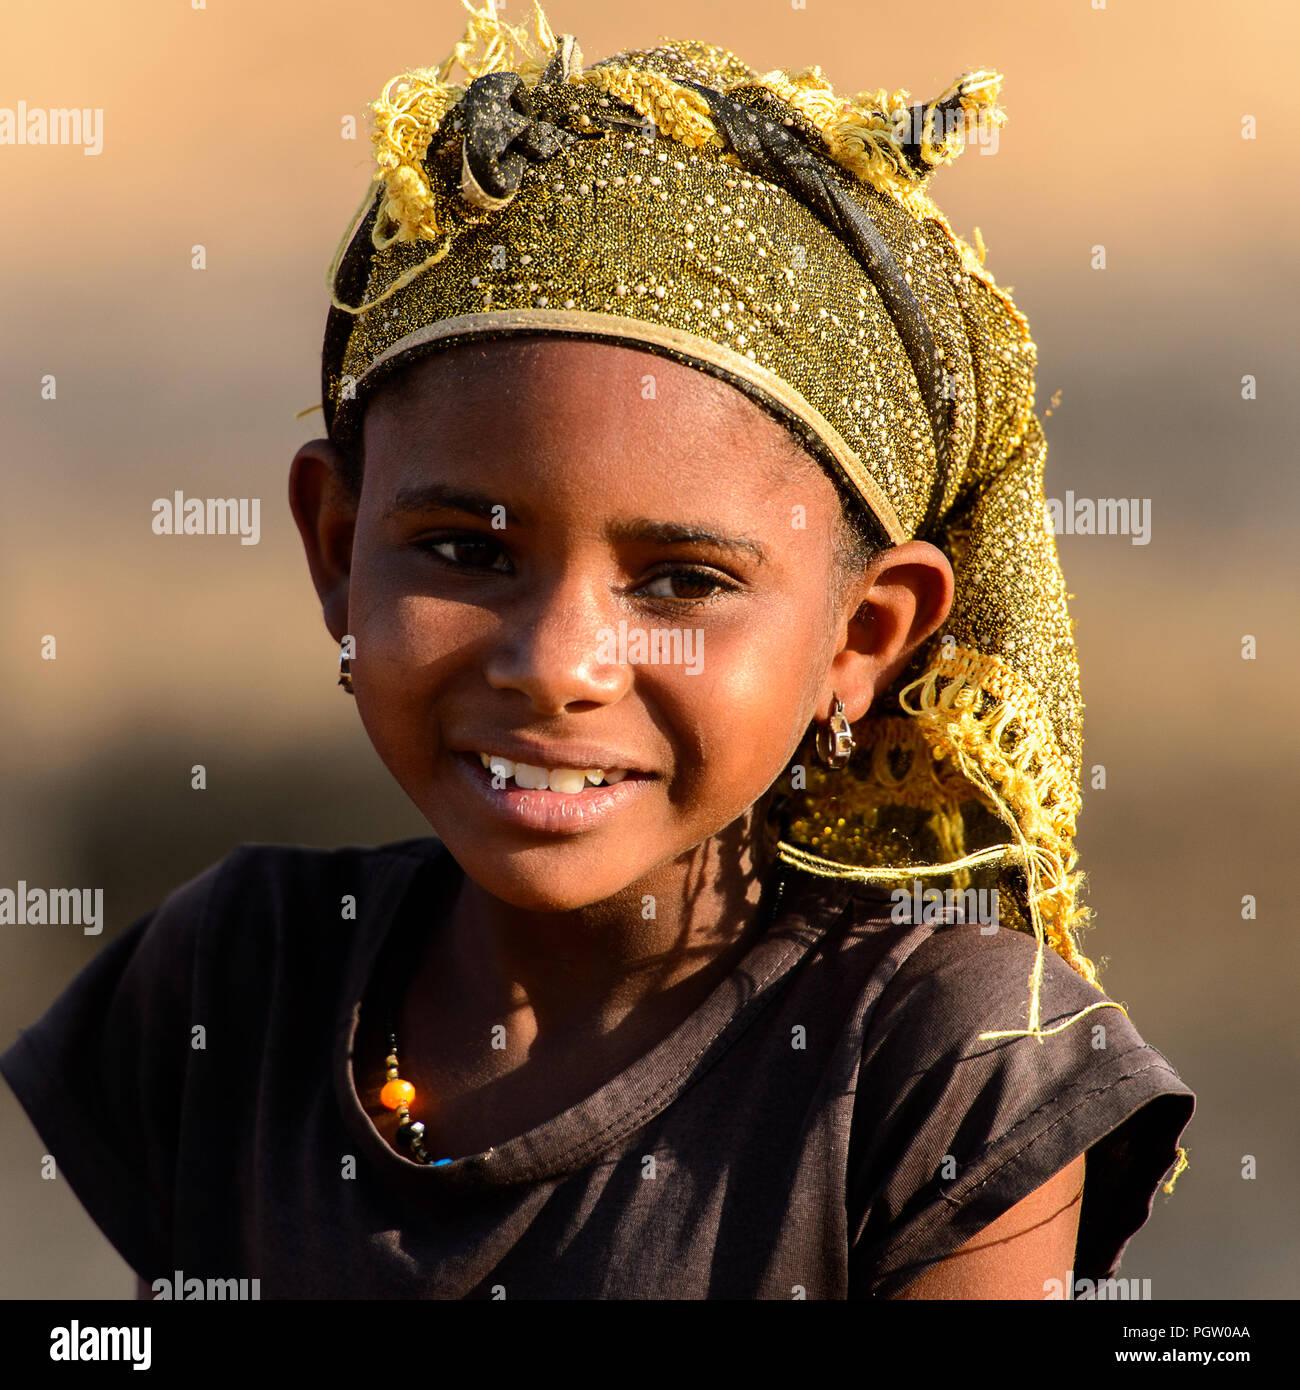 d sert de ferlo s n gal apr 25 2017 petite fille peul non identifi s en foulard sourit. Black Bedroom Furniture Sets. Home Design Ideas